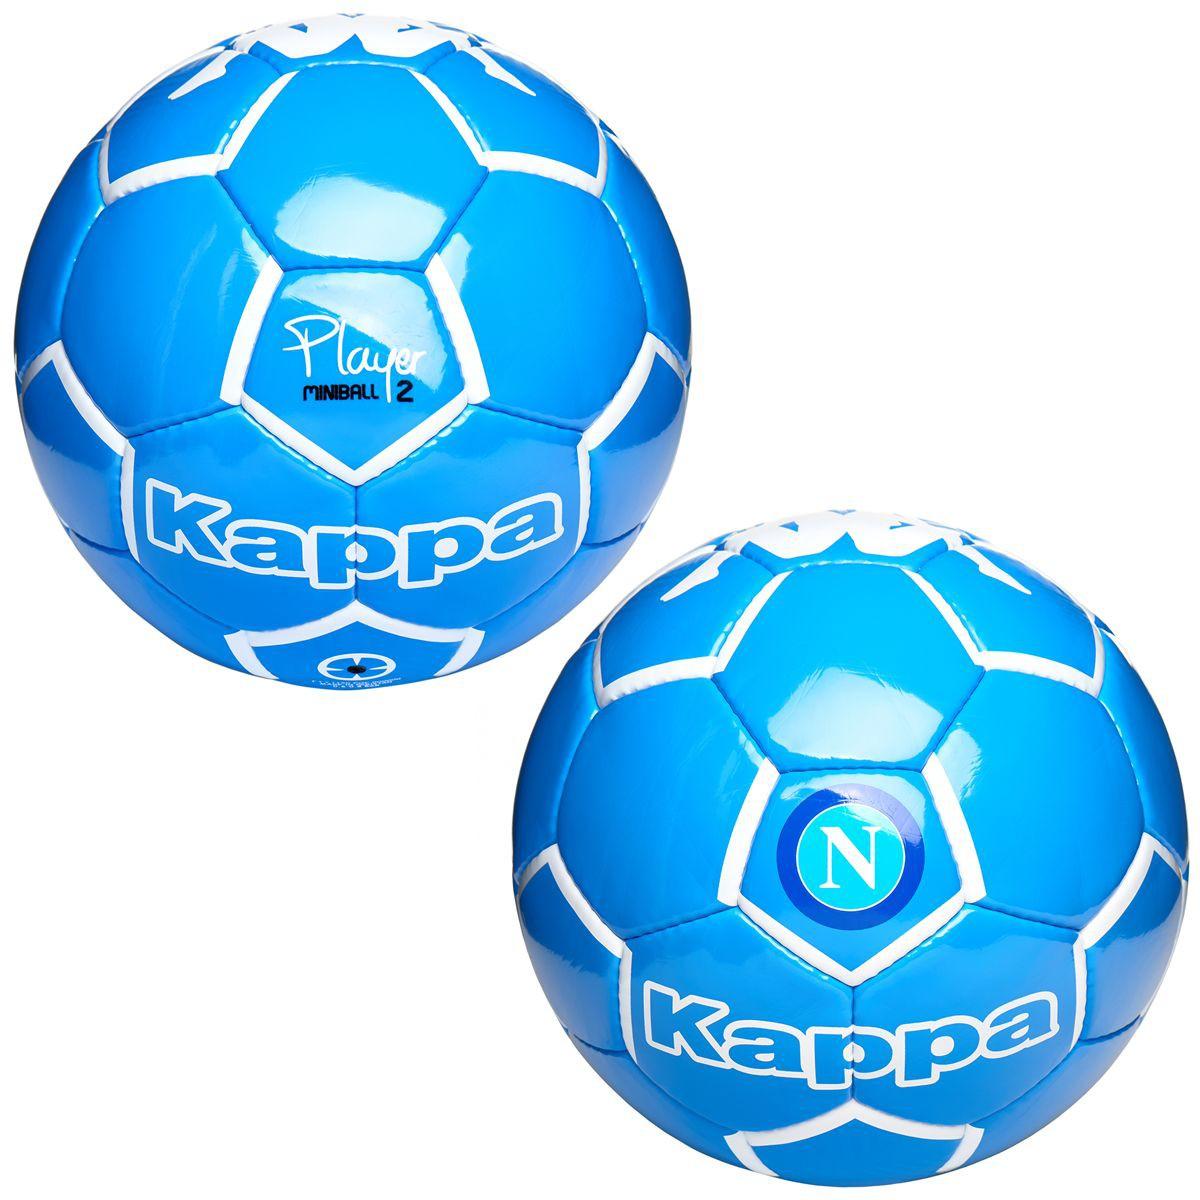 2016-2017 Napoli Kappa Mini Football (Blue)